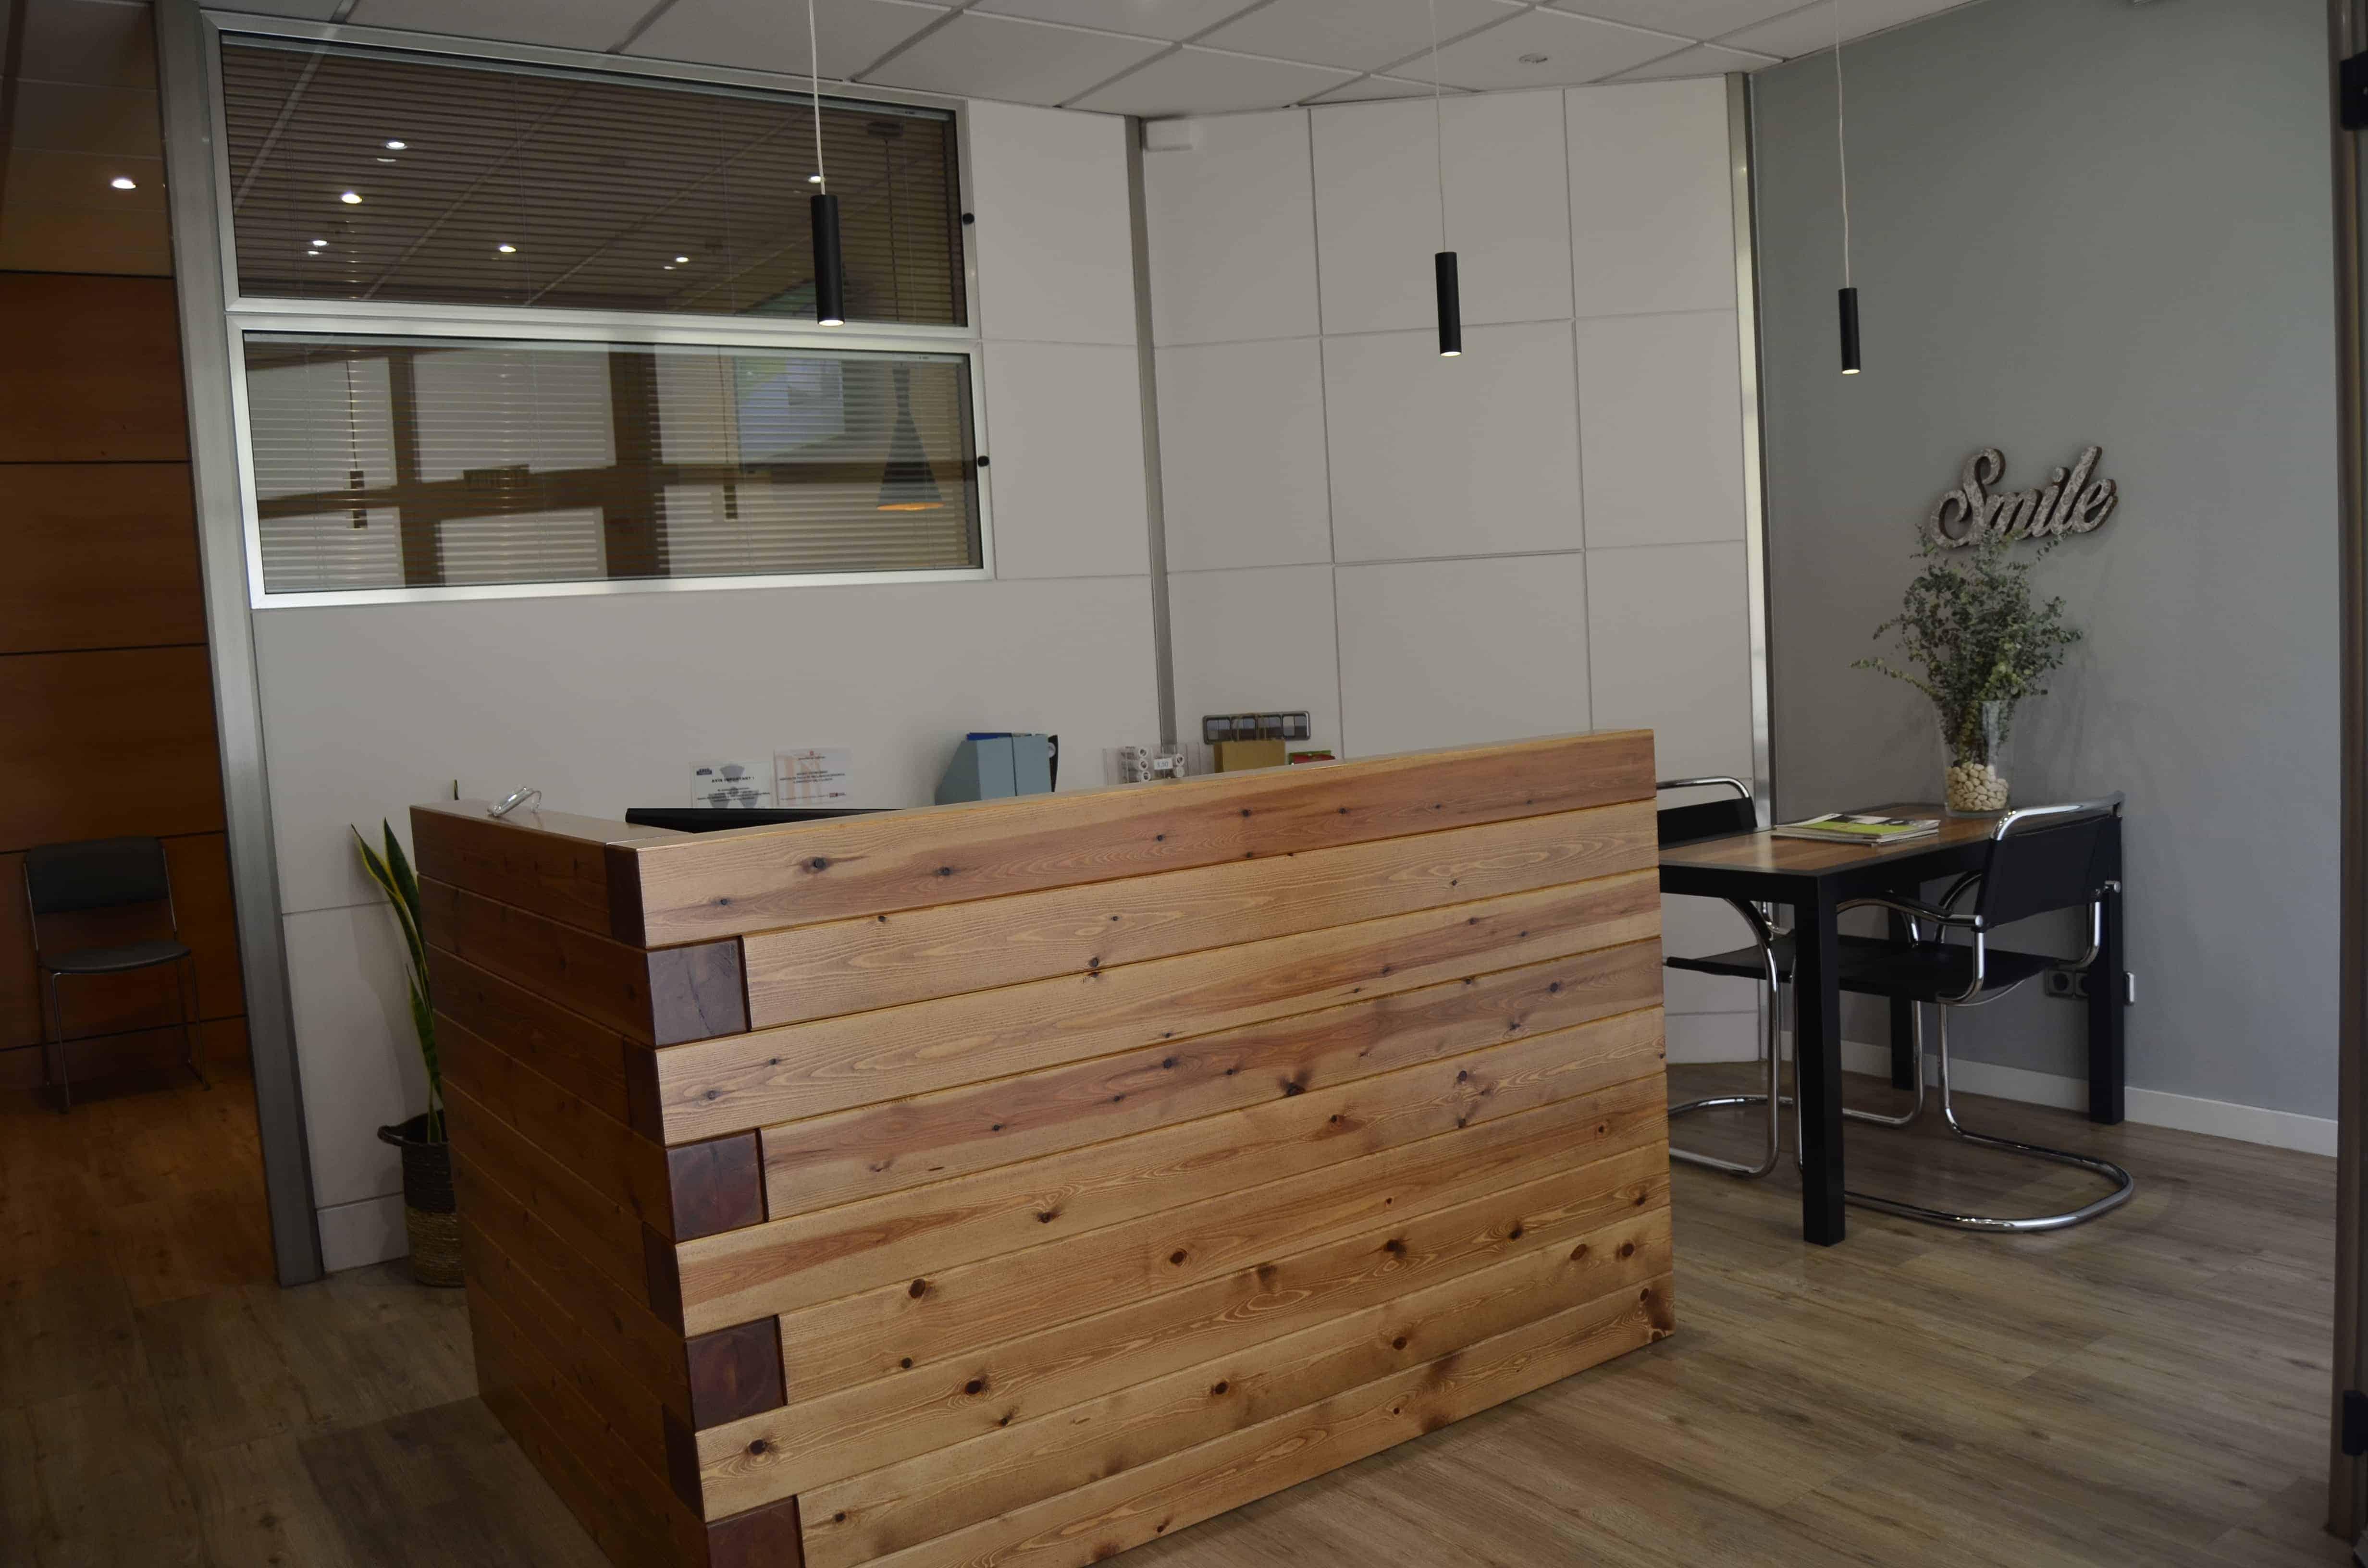 mostrador recepción clínica dental madera